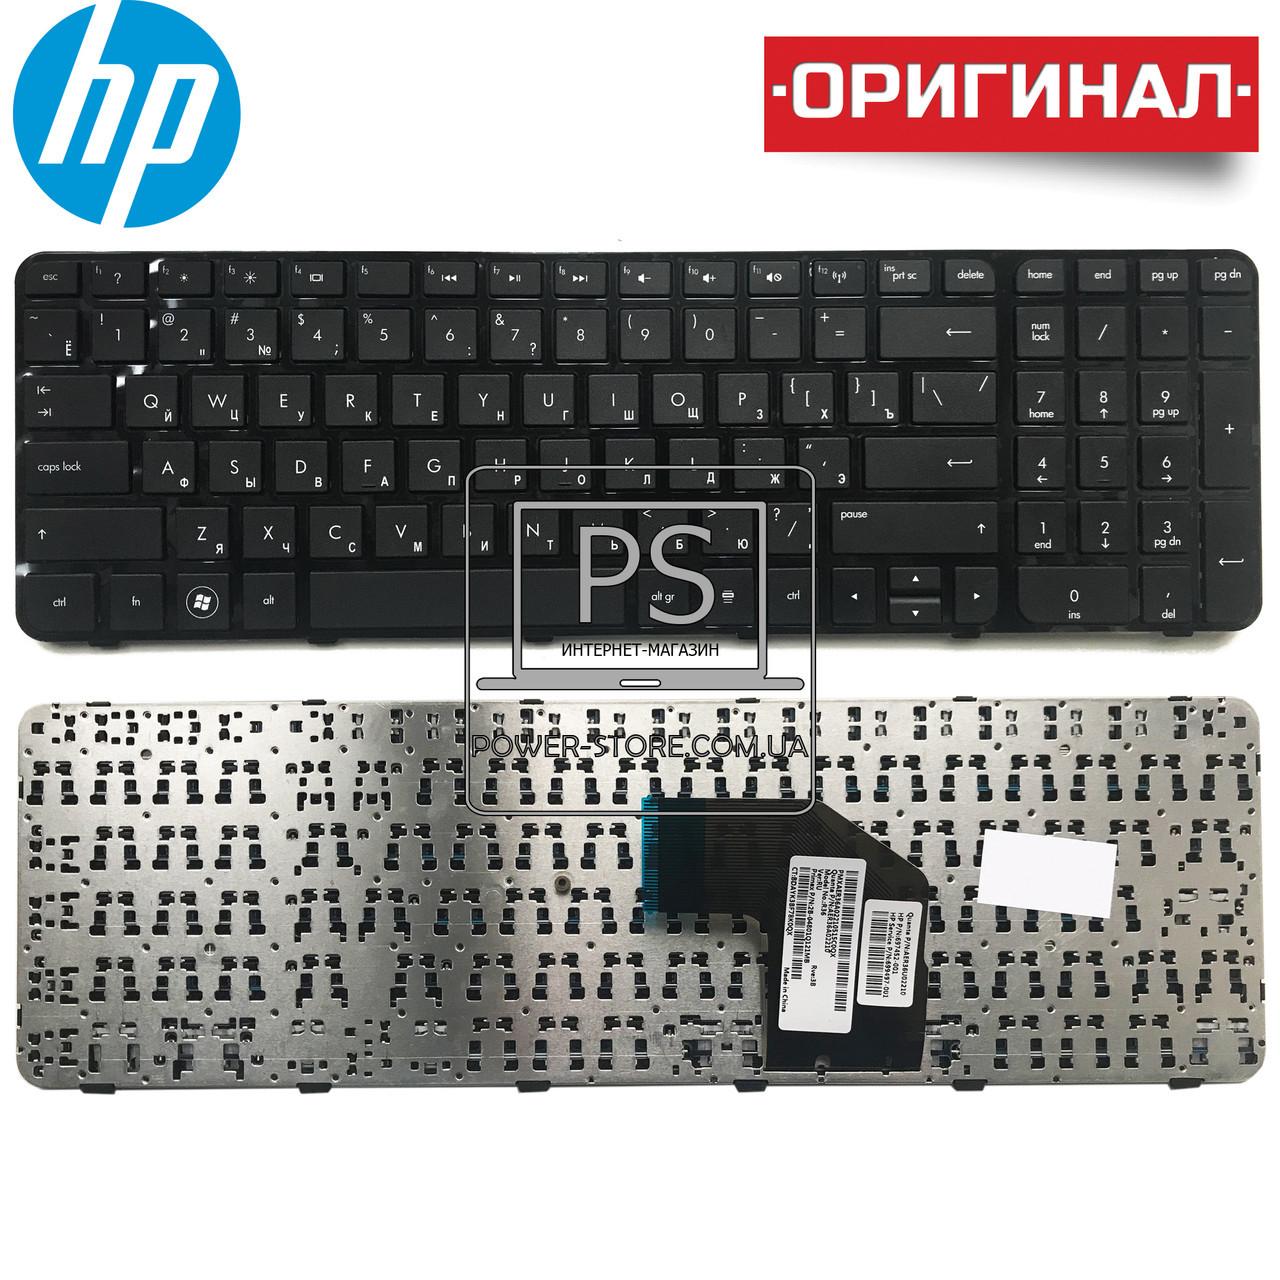 Клавиатура для ноутбука HP  684254-221, 684254-241, 684254-251, 684254-261, 684254-271, 684254-281,